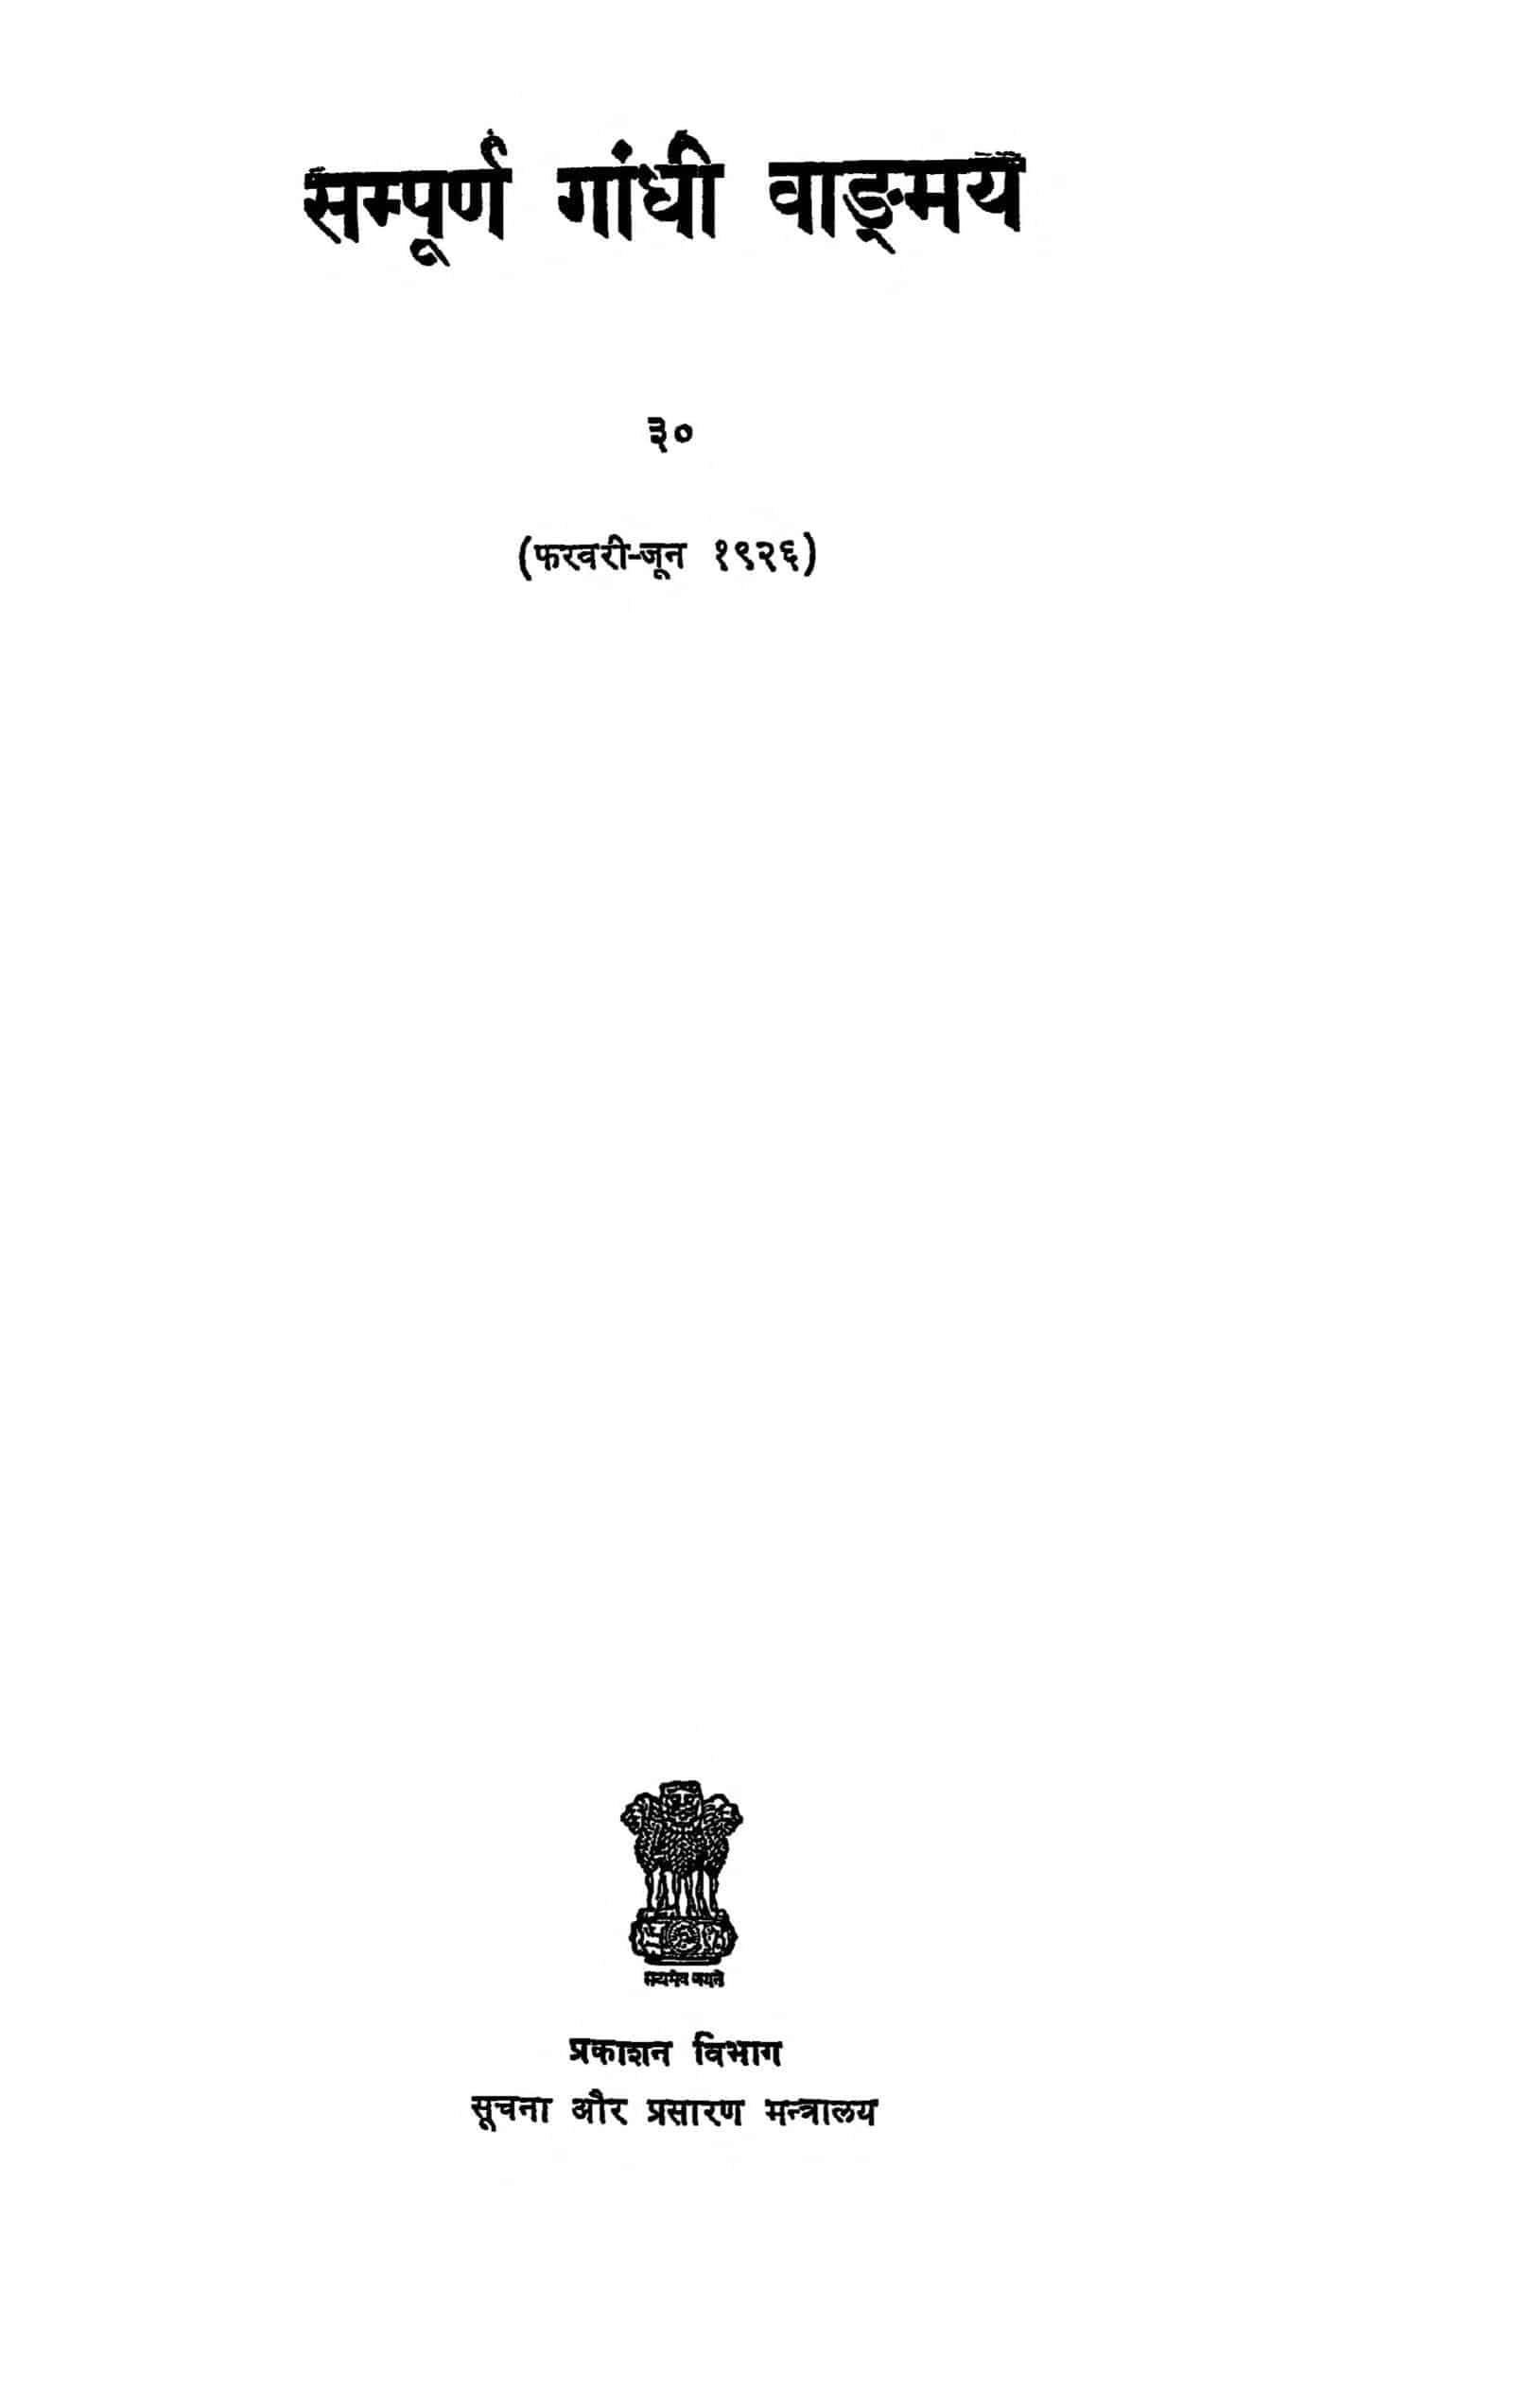 Book Image : सम्पूर्ण गांधी वाड्मय भाग 30 - Sampurna Gandhi Vaangmay Bhag 30